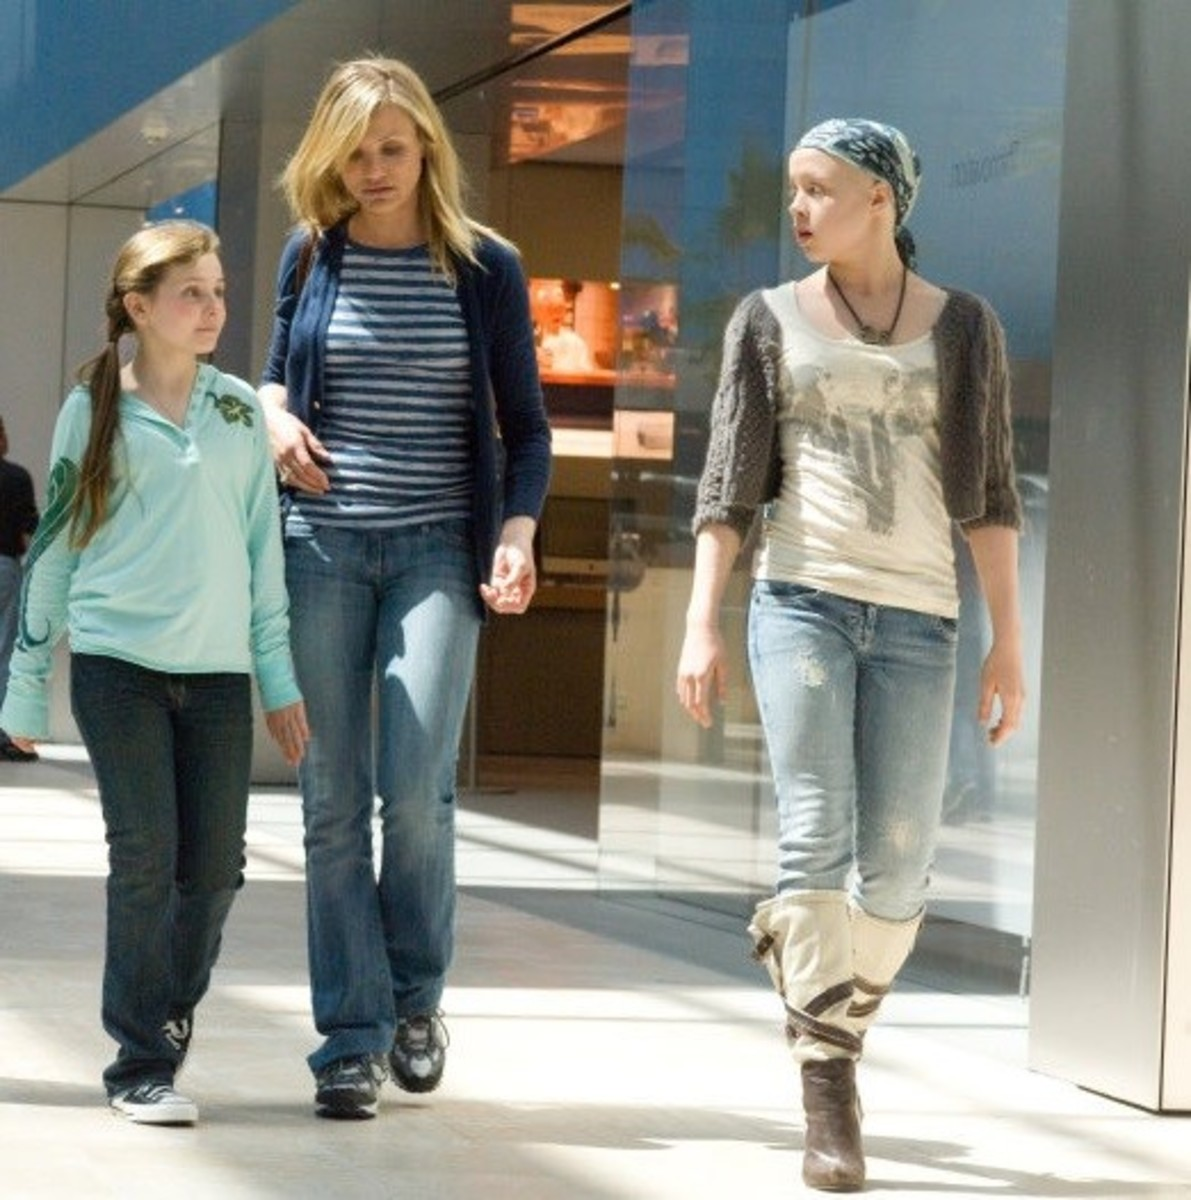 Cameron Diaz, Sofia Vassilieva, and Abigail Breslin in My Sister's Keeper (2009)